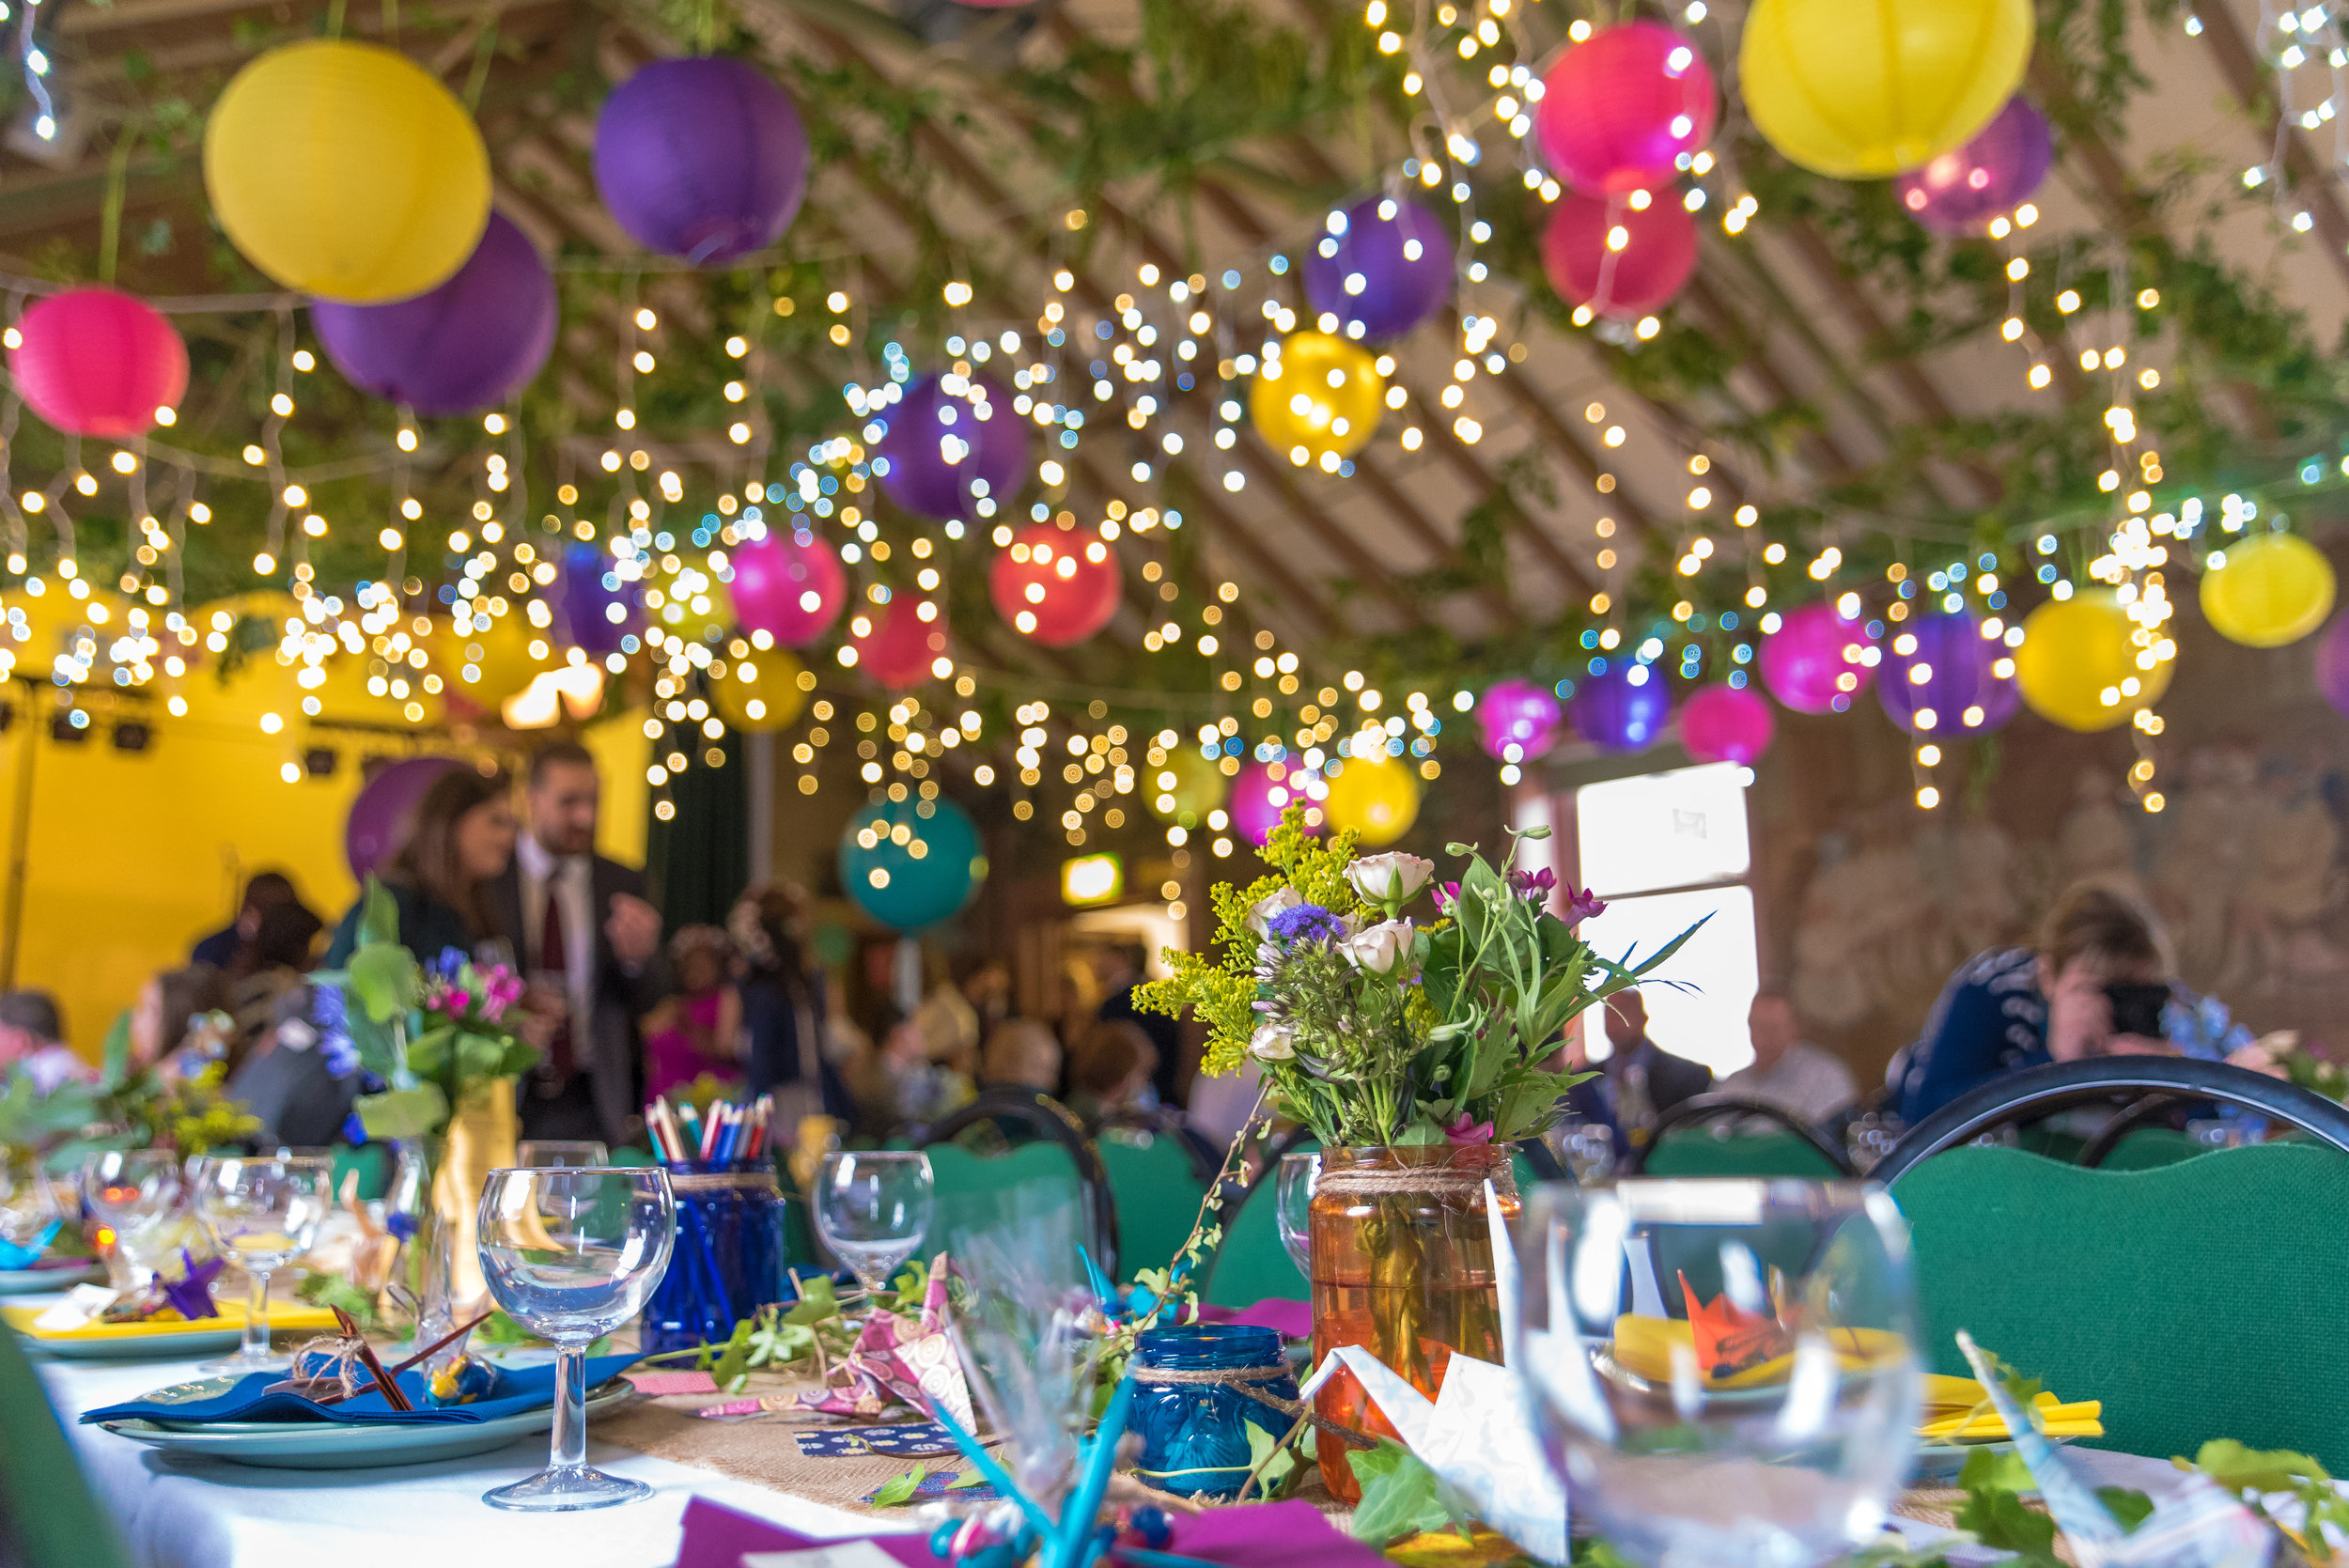 Hampshire-Village-Hall-Wedding-Venue / Sarah-Fishlock-Photography / Fleet-Hampshire-Wedding-Photographer / Surrey-village-hall-wedding / Village-Hall-Wedding-Ideas-Inspiration / Village-fete-wedding / New-Forest-Village-Hall-Wedding